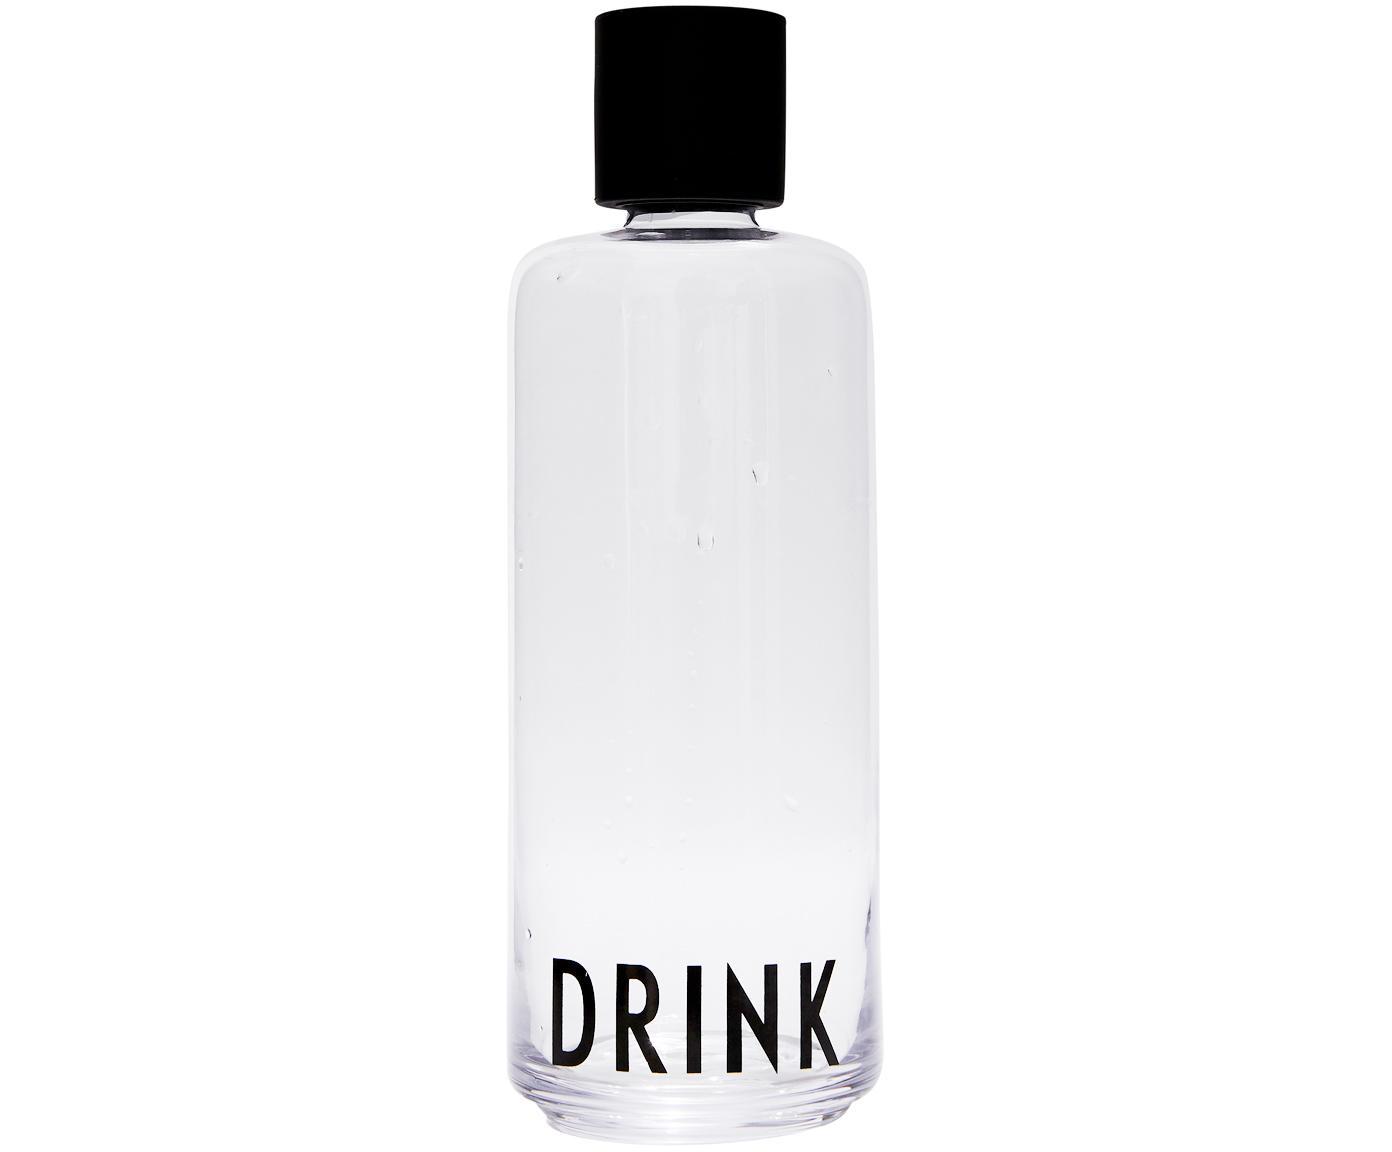 Jarra Daily Drink, Transparente, 1 L